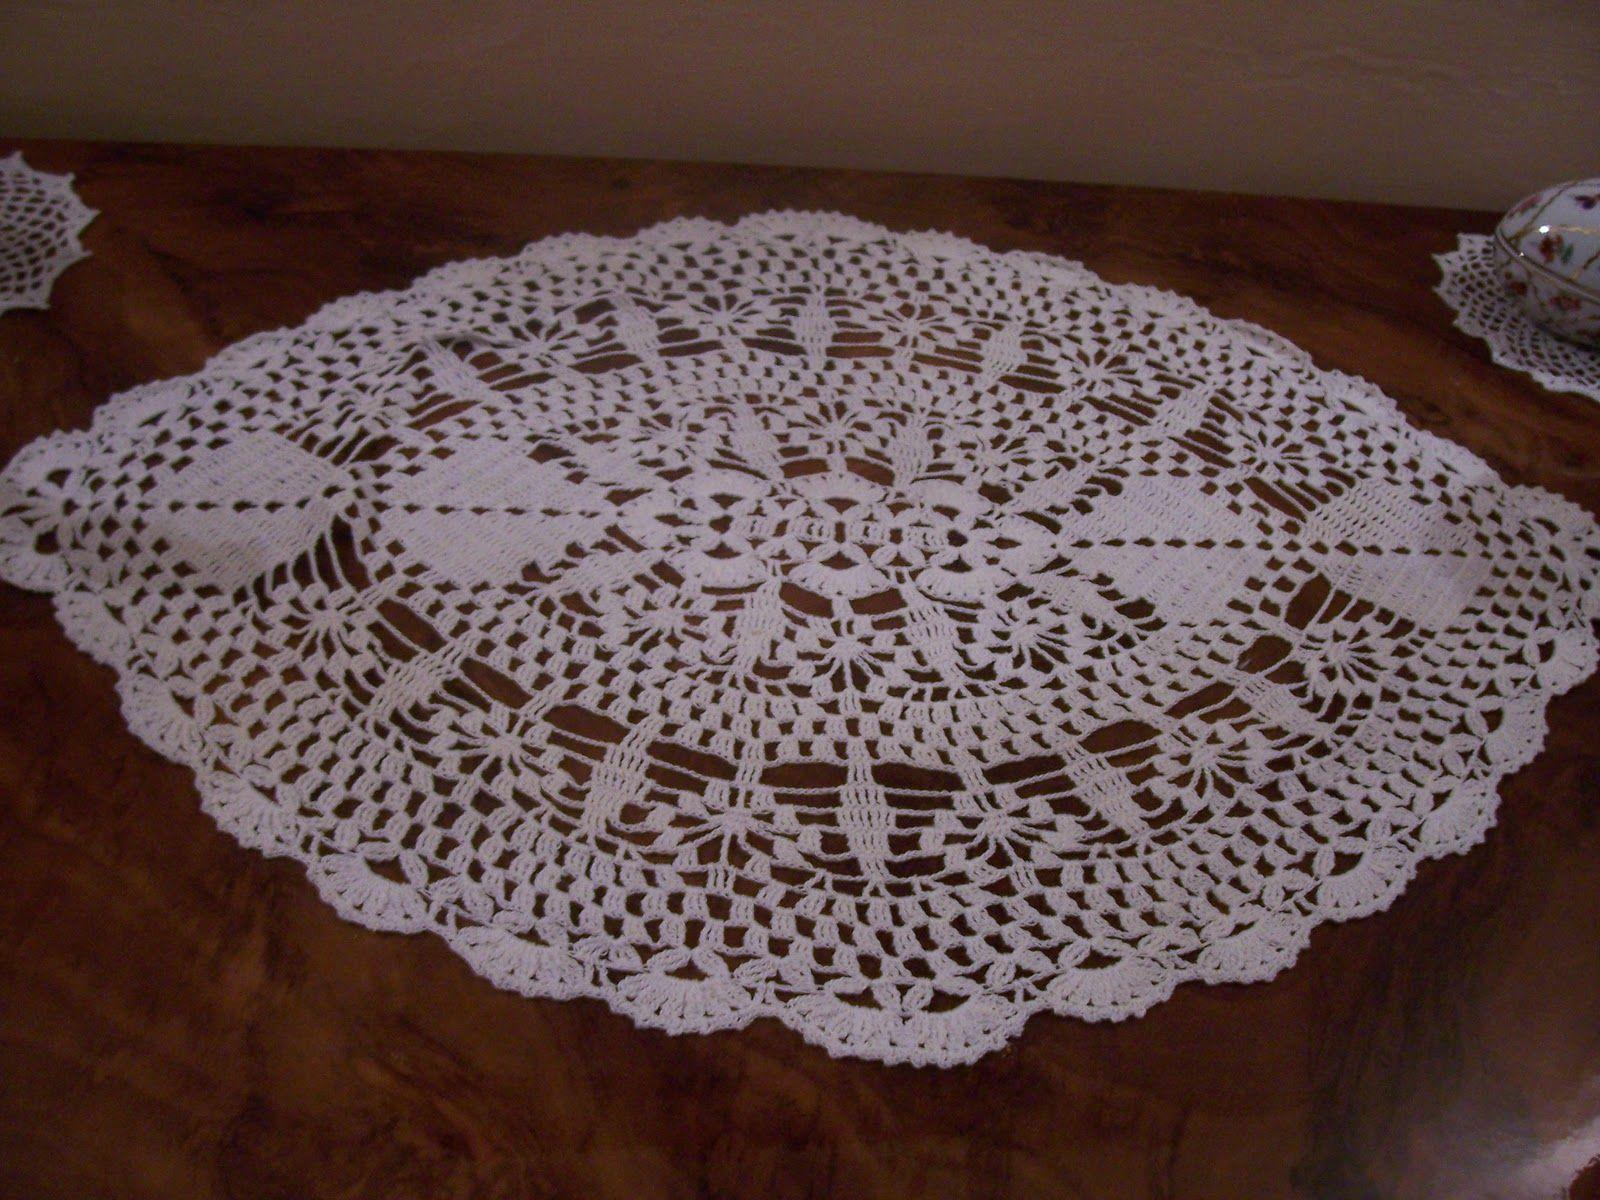 Pineapple Crochet Doily Diagram Car Starter Wiring Easy Patterns Free Oval